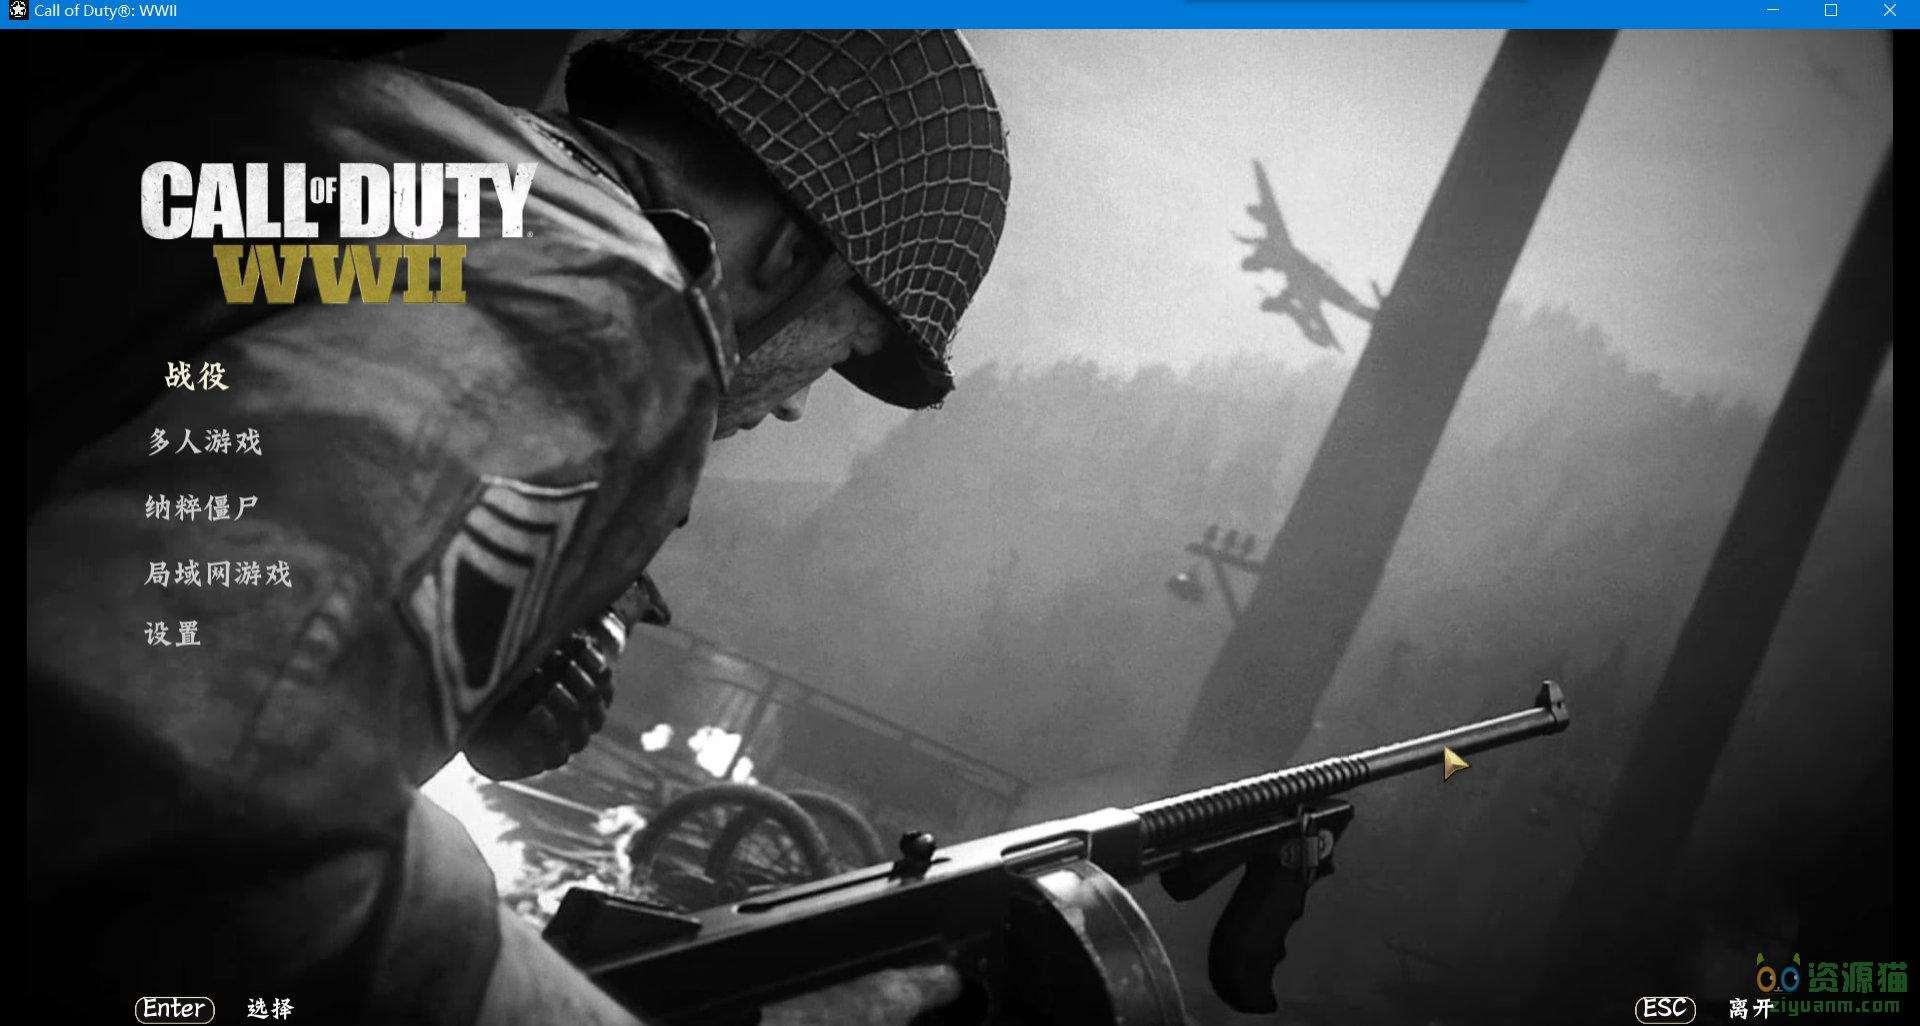 使命召唤:二战 (Call of Duty: WWII)